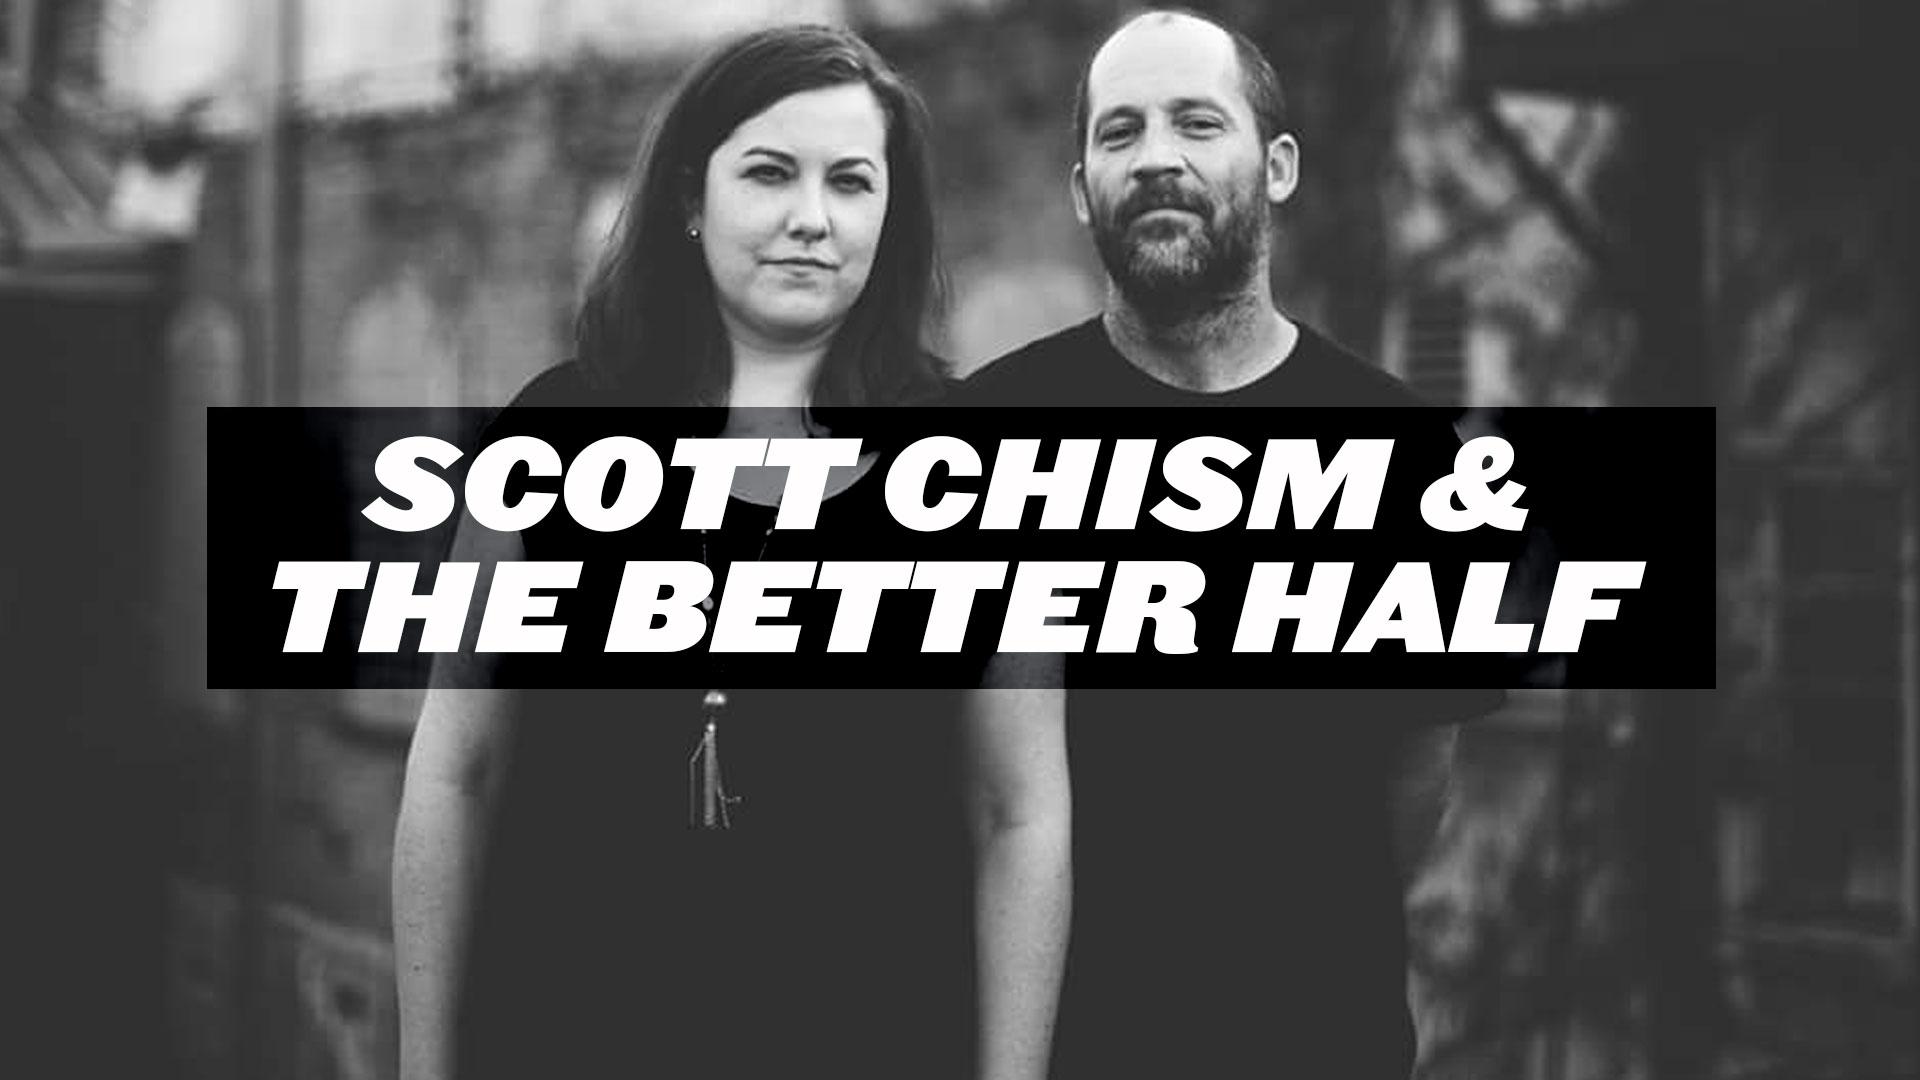 scott-chism-and-the-better-half.jpg